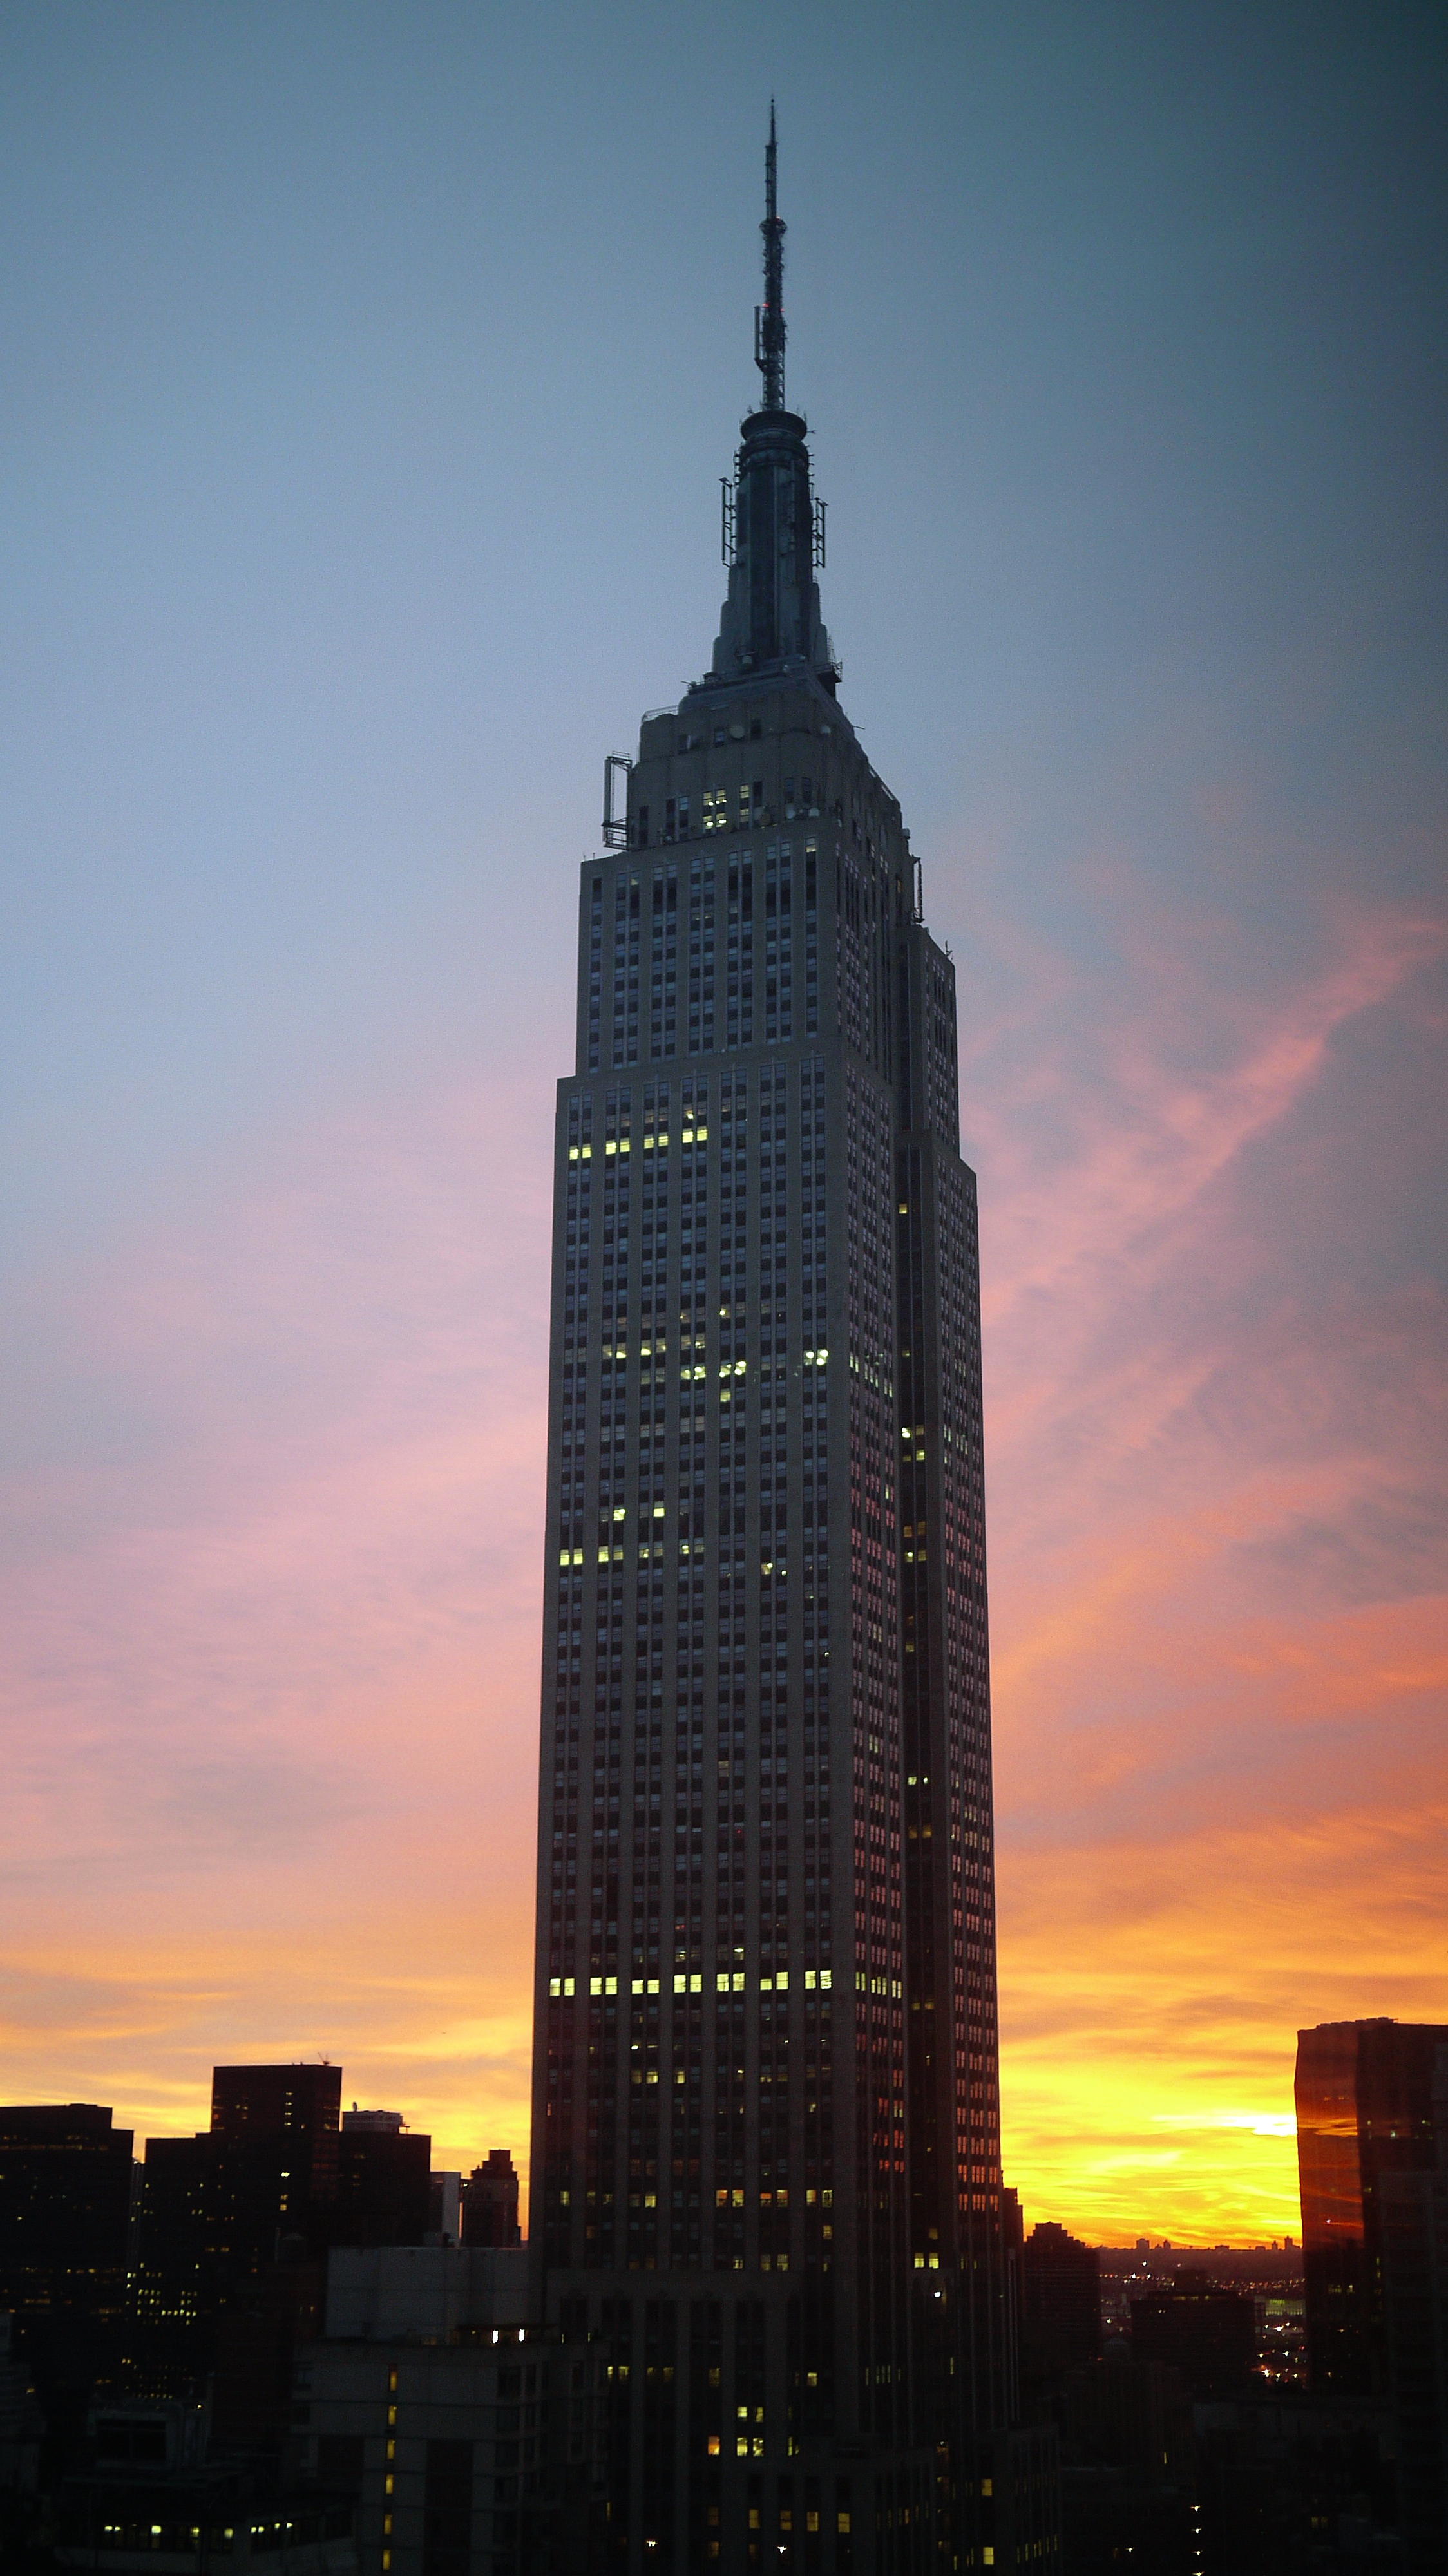 Early sunrise before #walkingtoworktoday